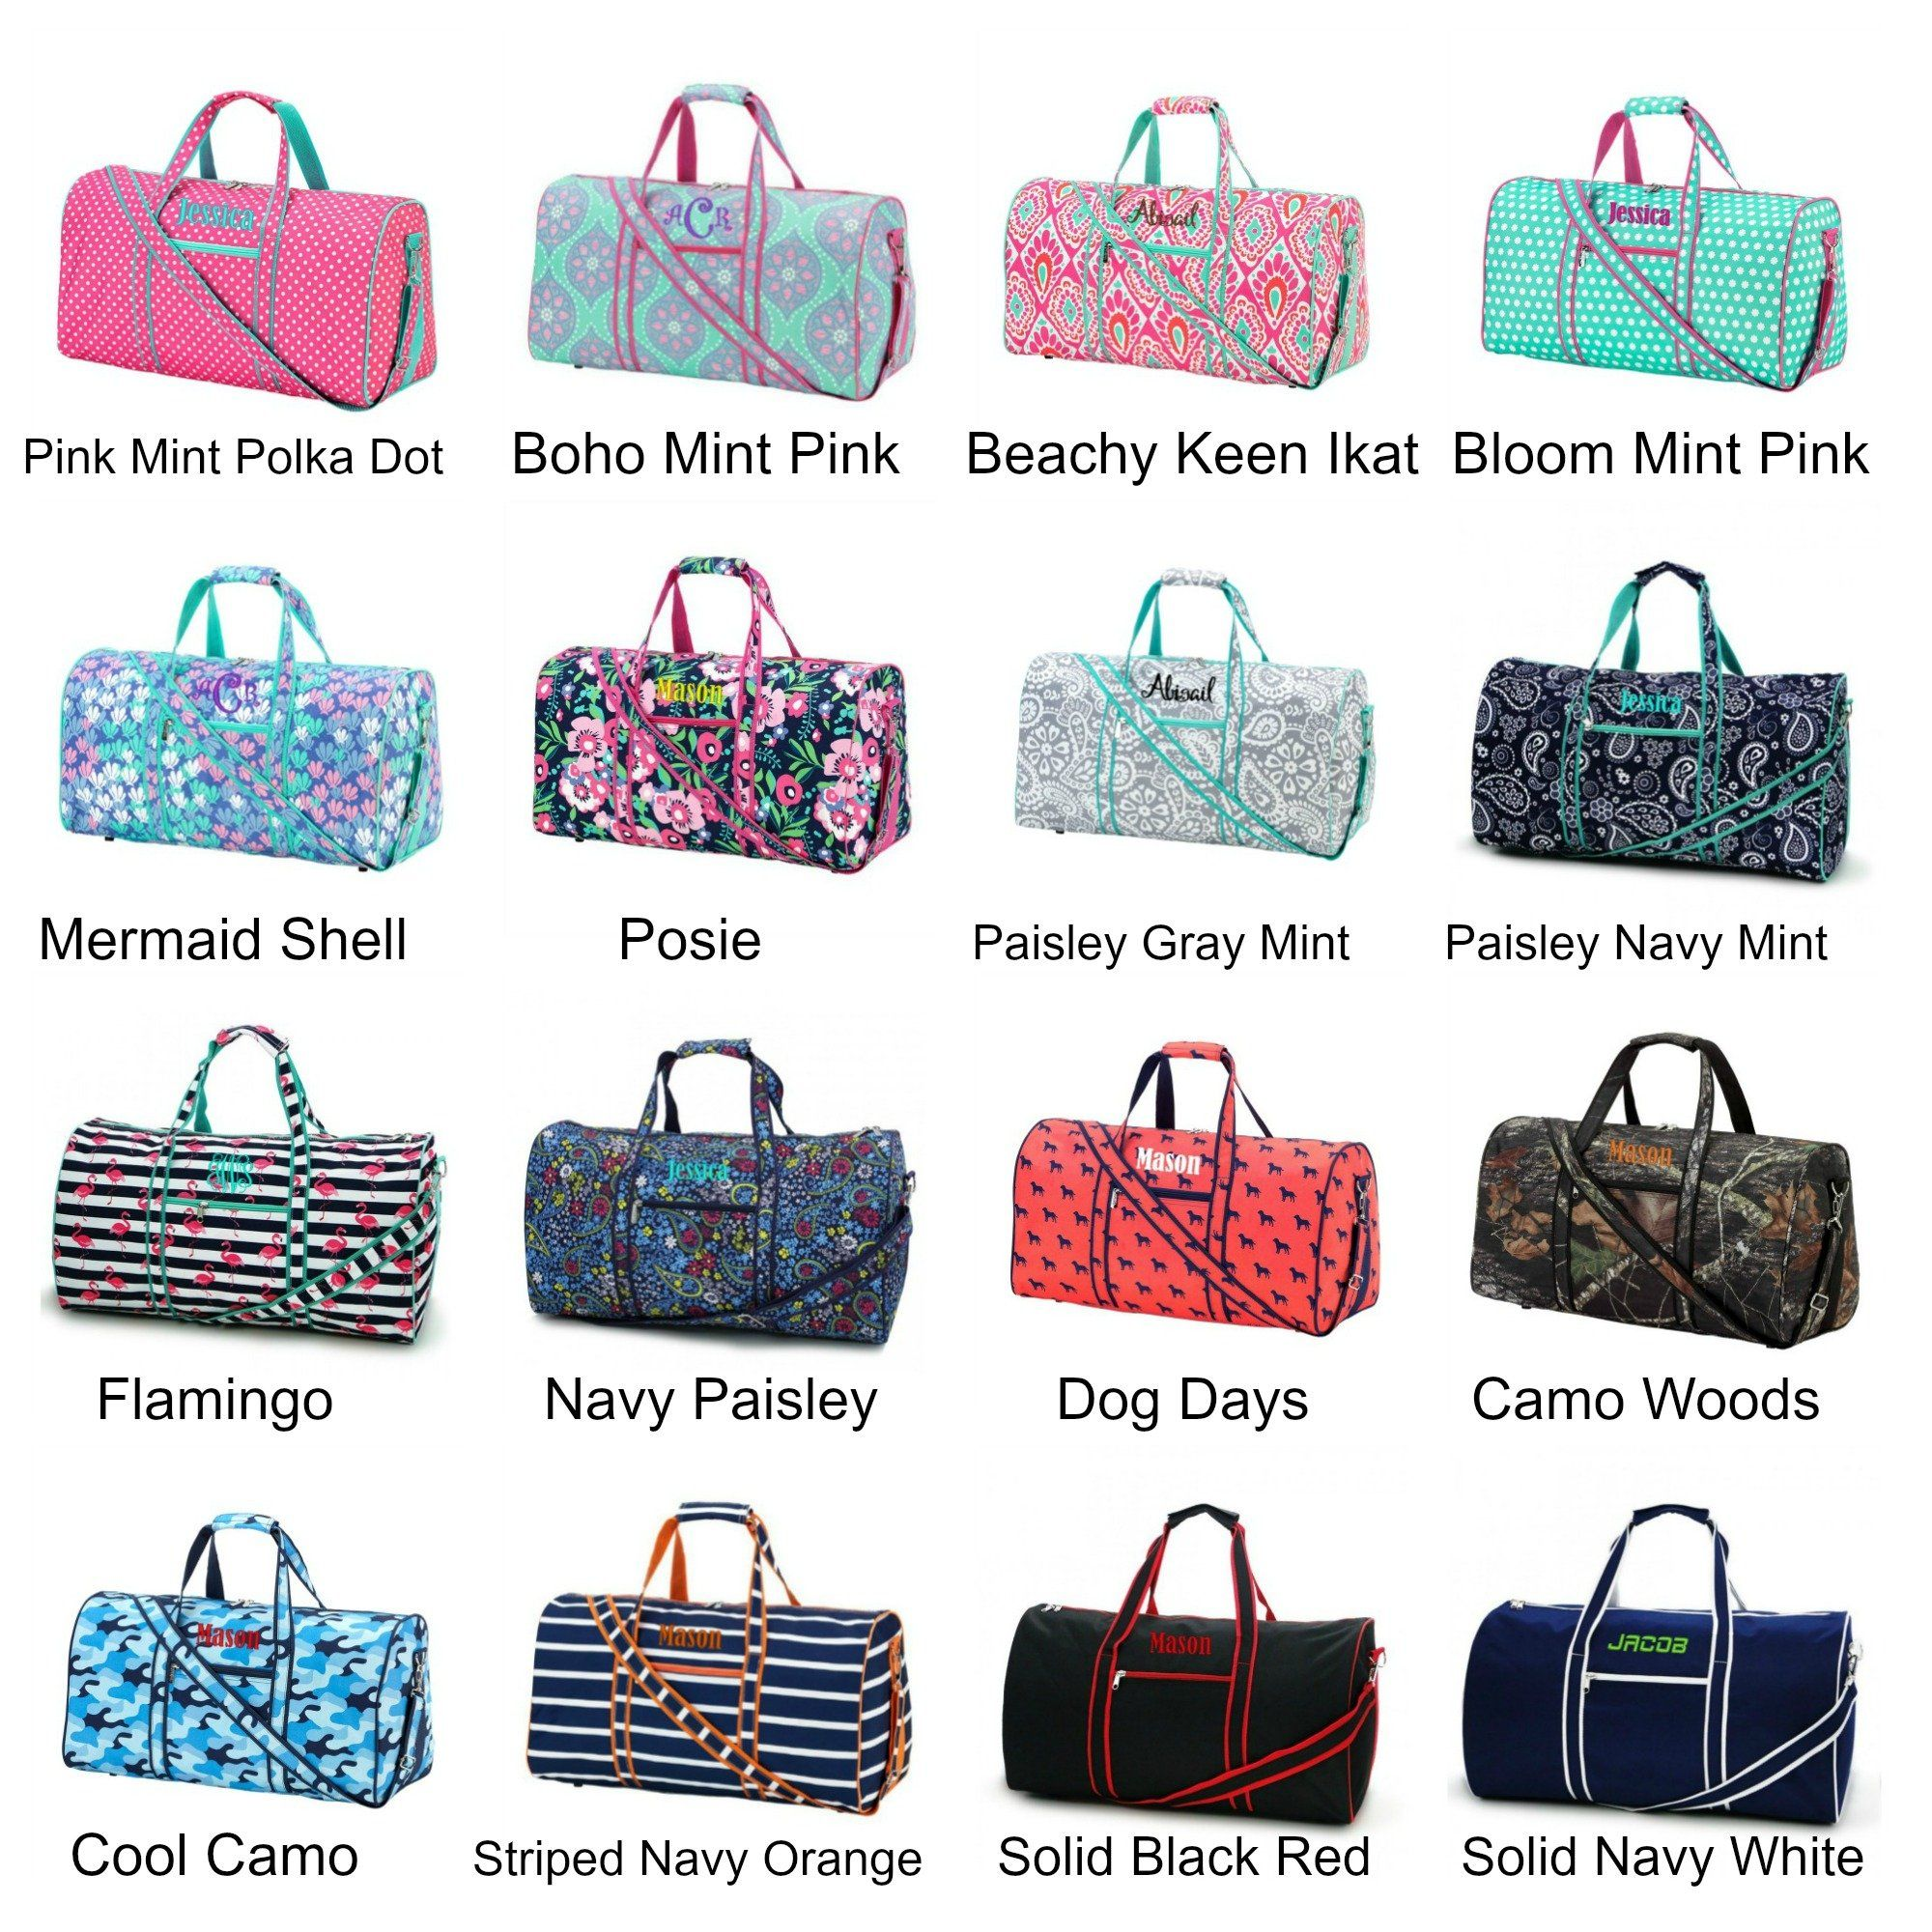 c2b7e570e04 Personalized Large Barrel Duffel Bag Kids Teen Travel - Cool Camo ...